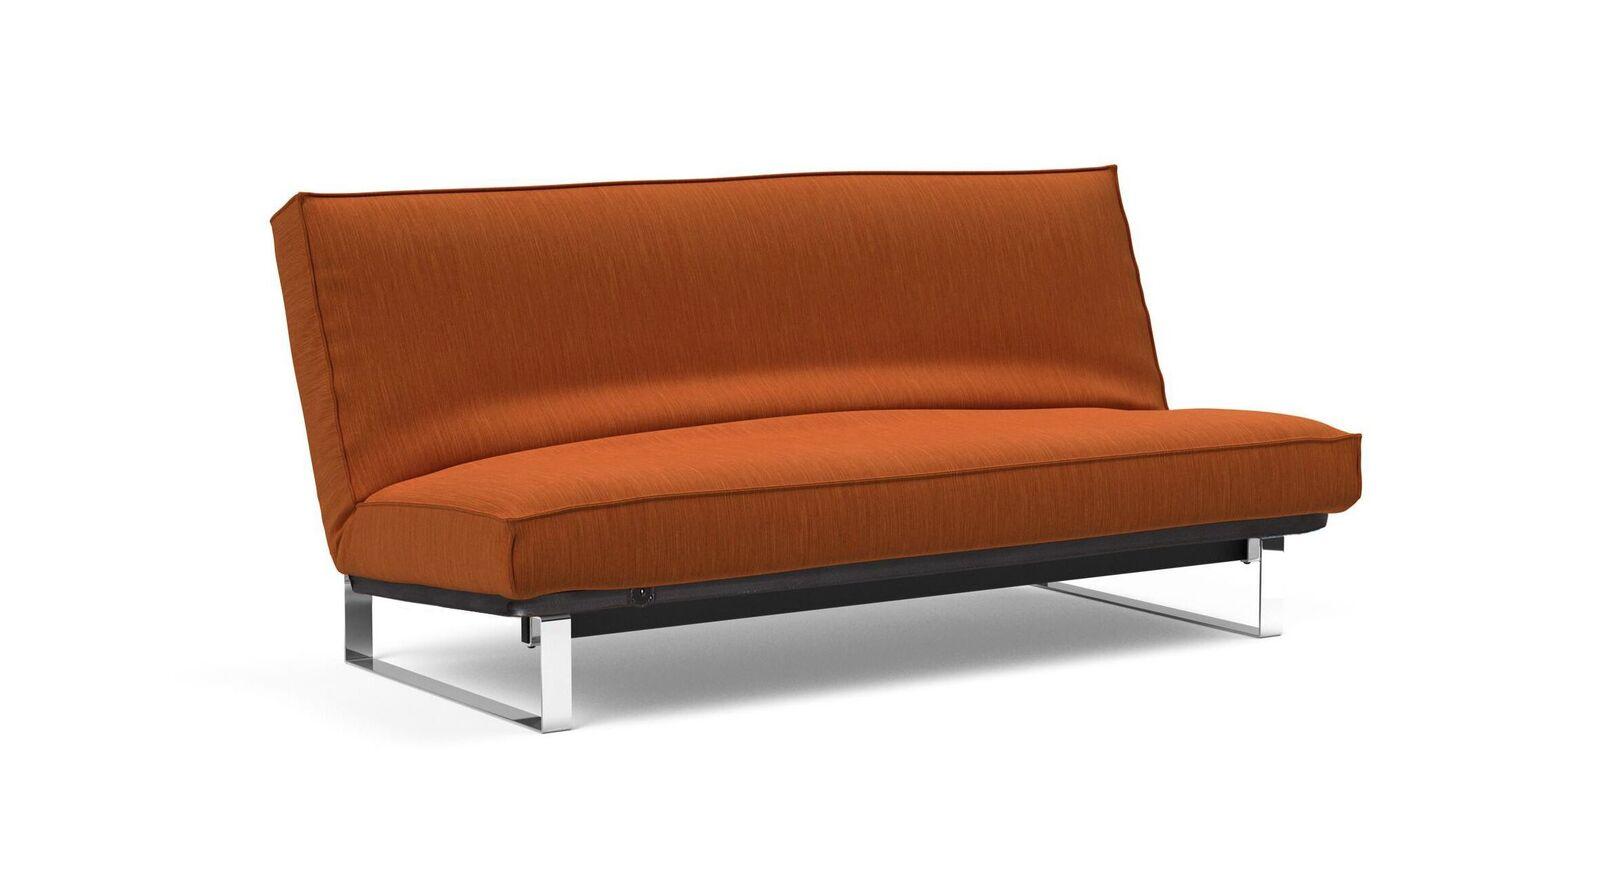 Schlafsofa Astoria in Elegance orange